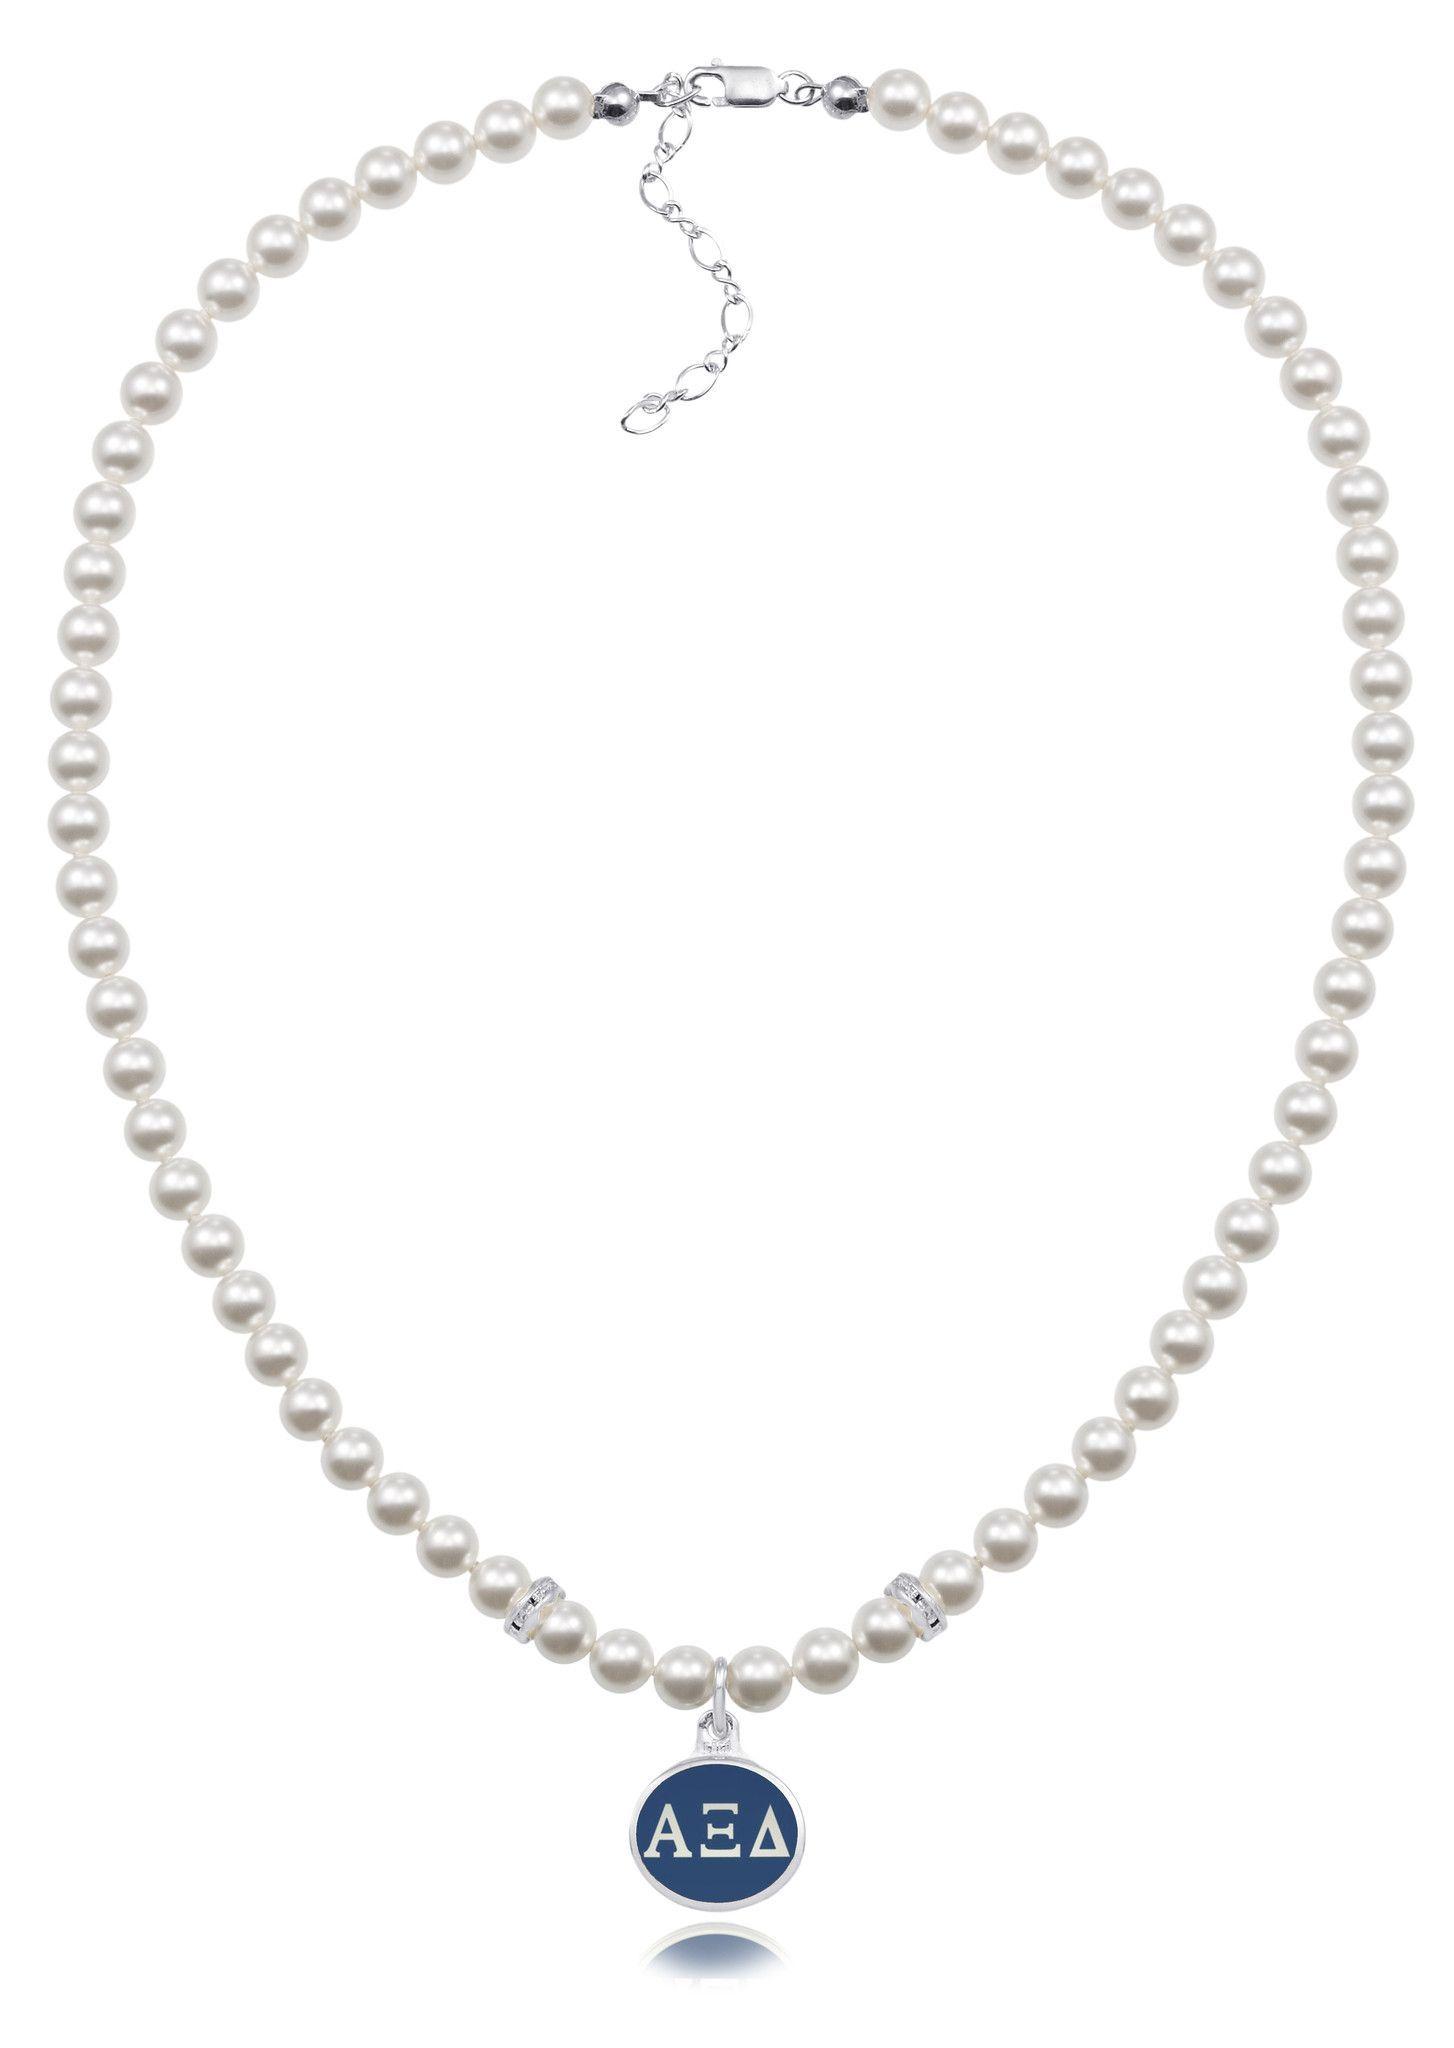 Alpha Xi Delta Swarovski White Pearl Necklace with Enamel Charm